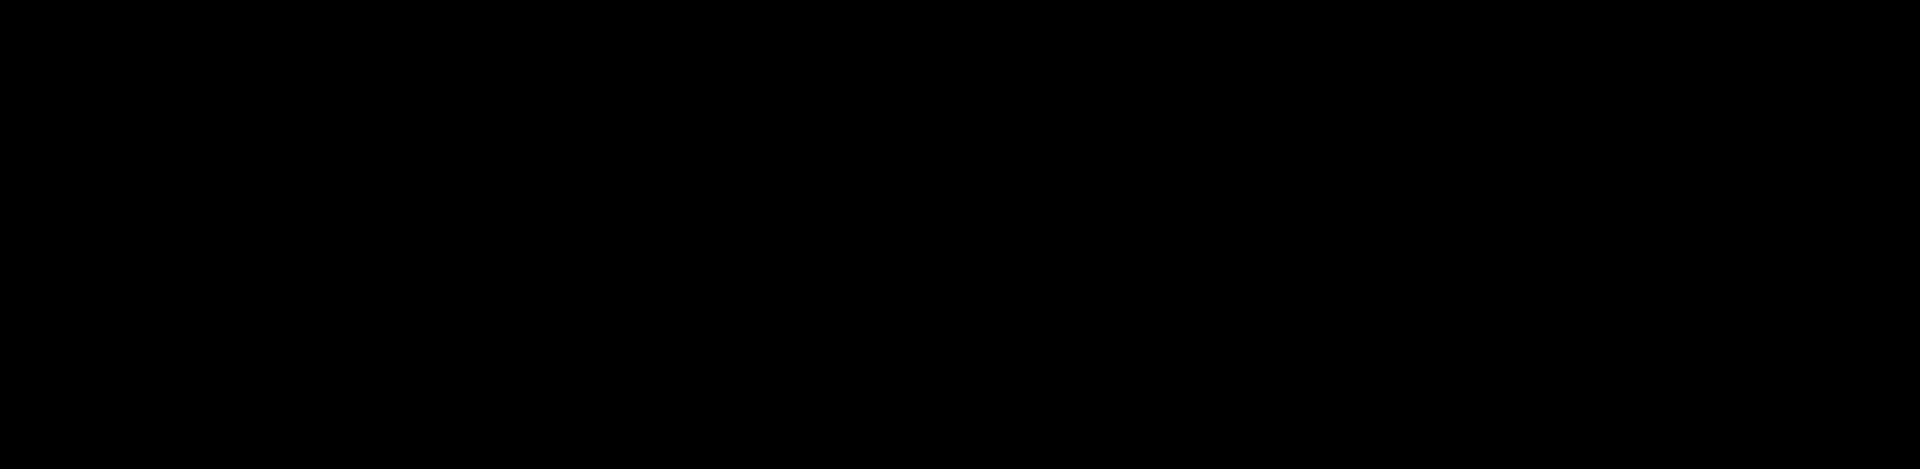 PHOENIX KALKAN